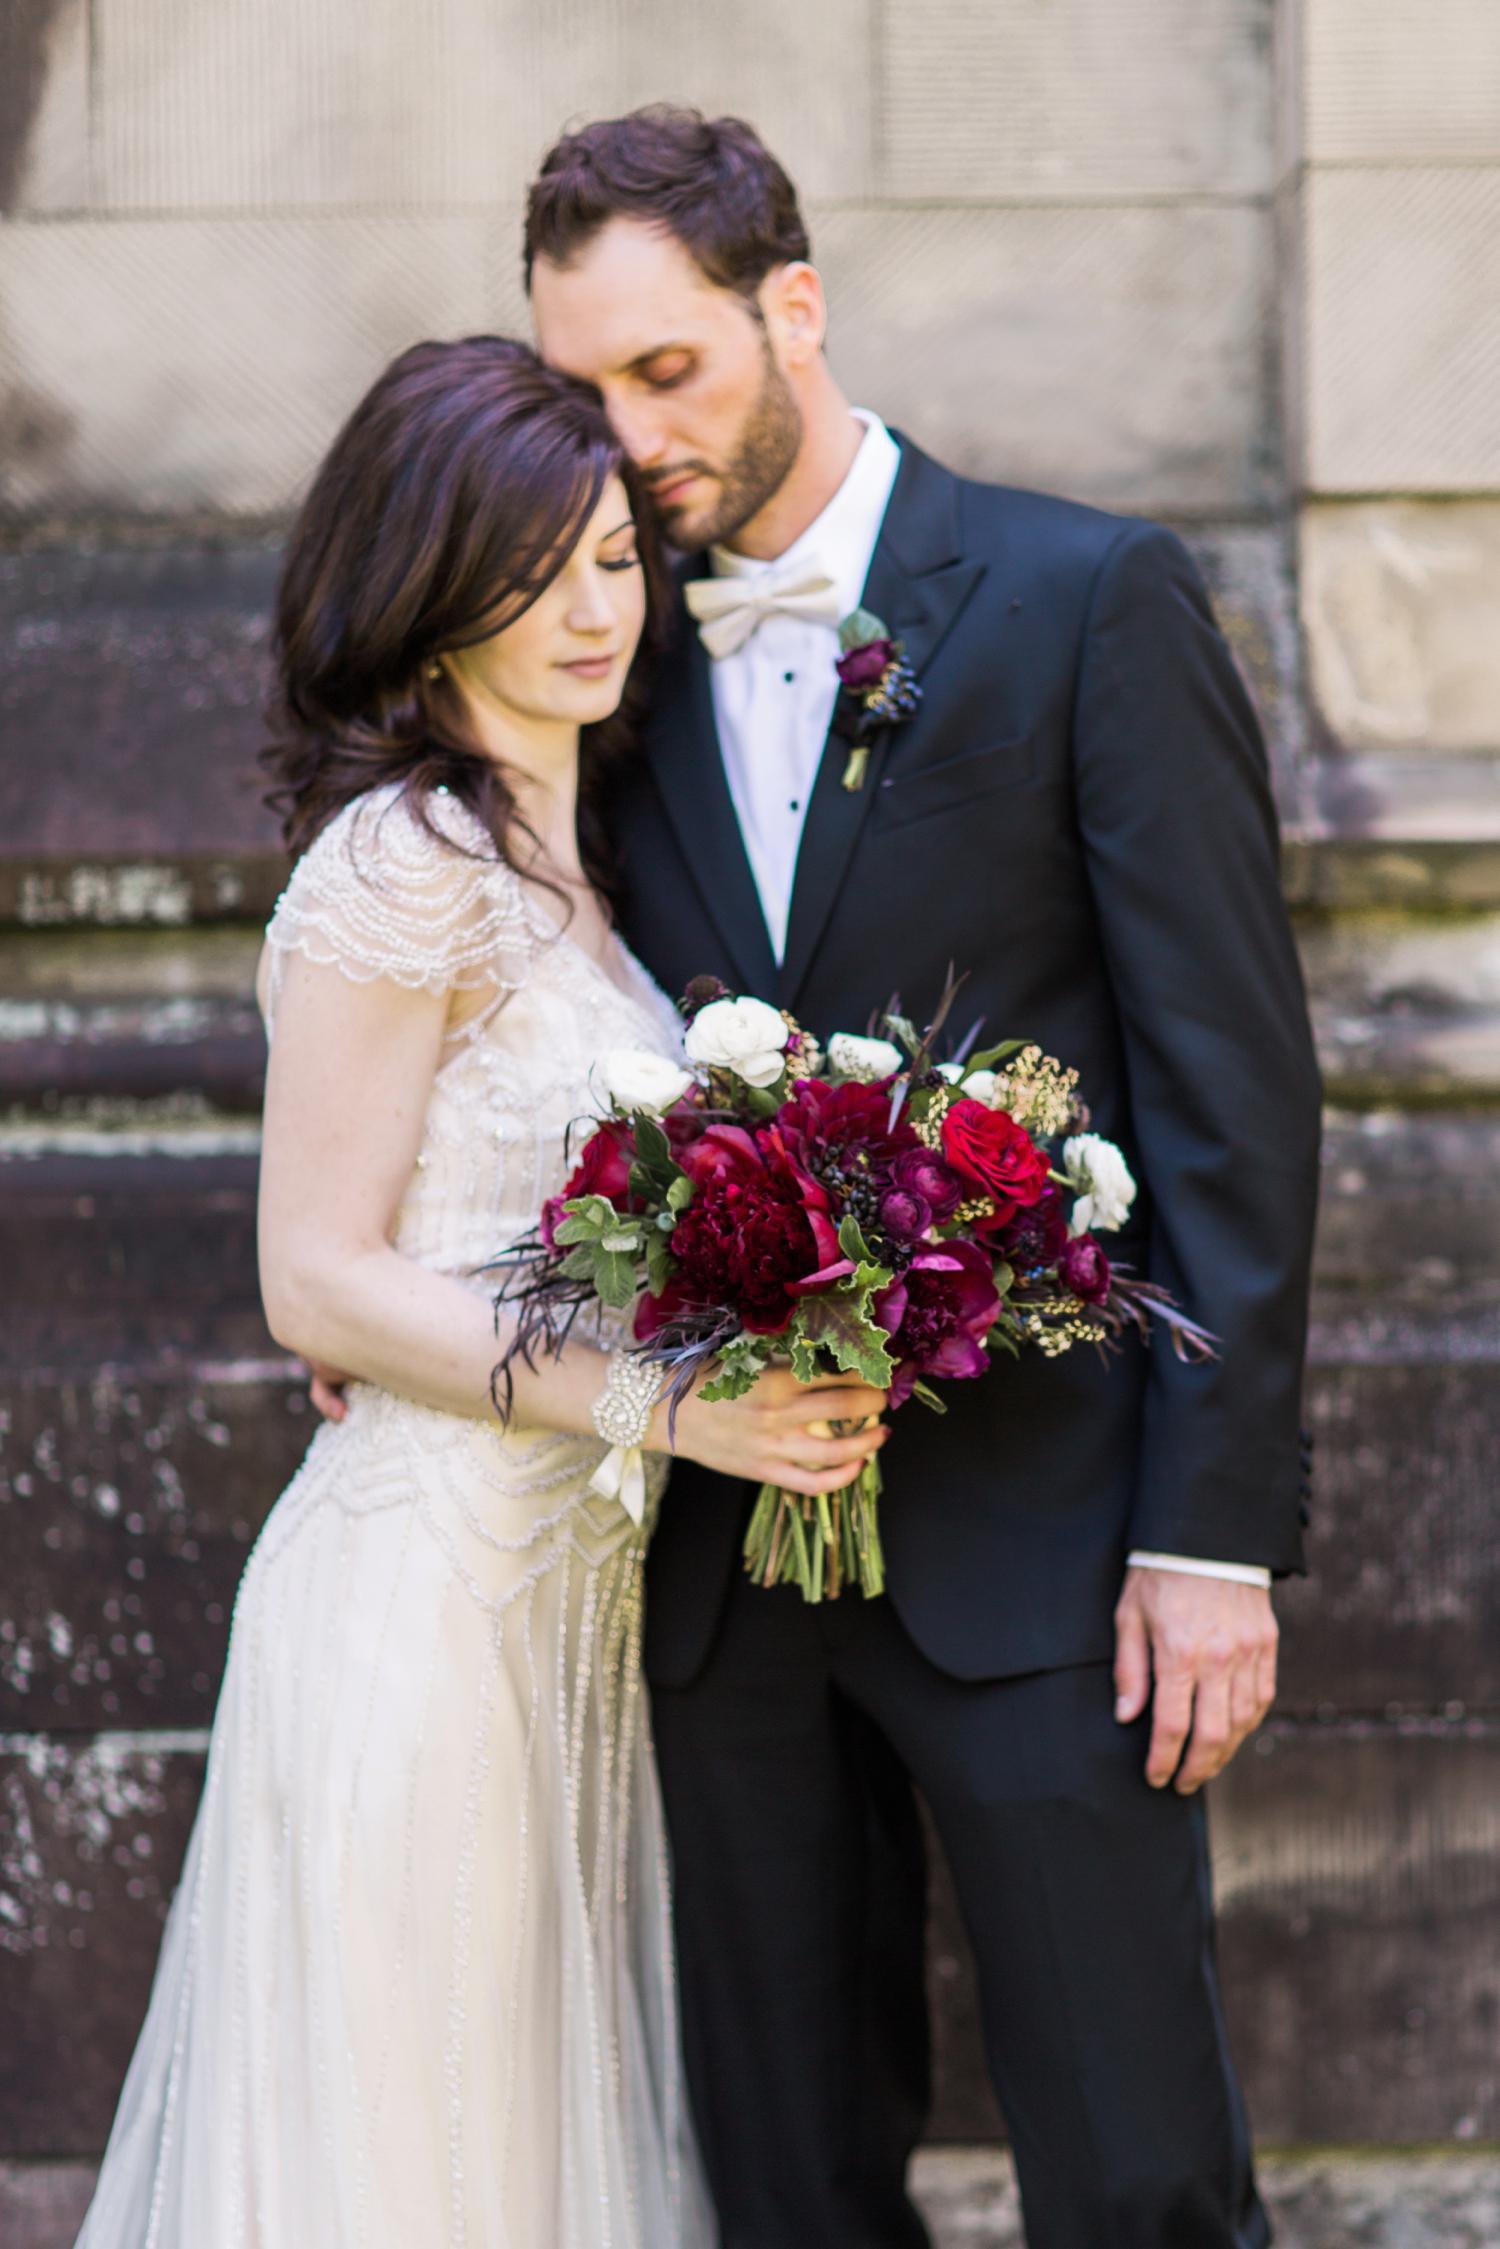 Bell_Event_Centre_Cincinnati_Ohio_Wedding_Photography_Chloe_Luka_Photography_6450.jpg